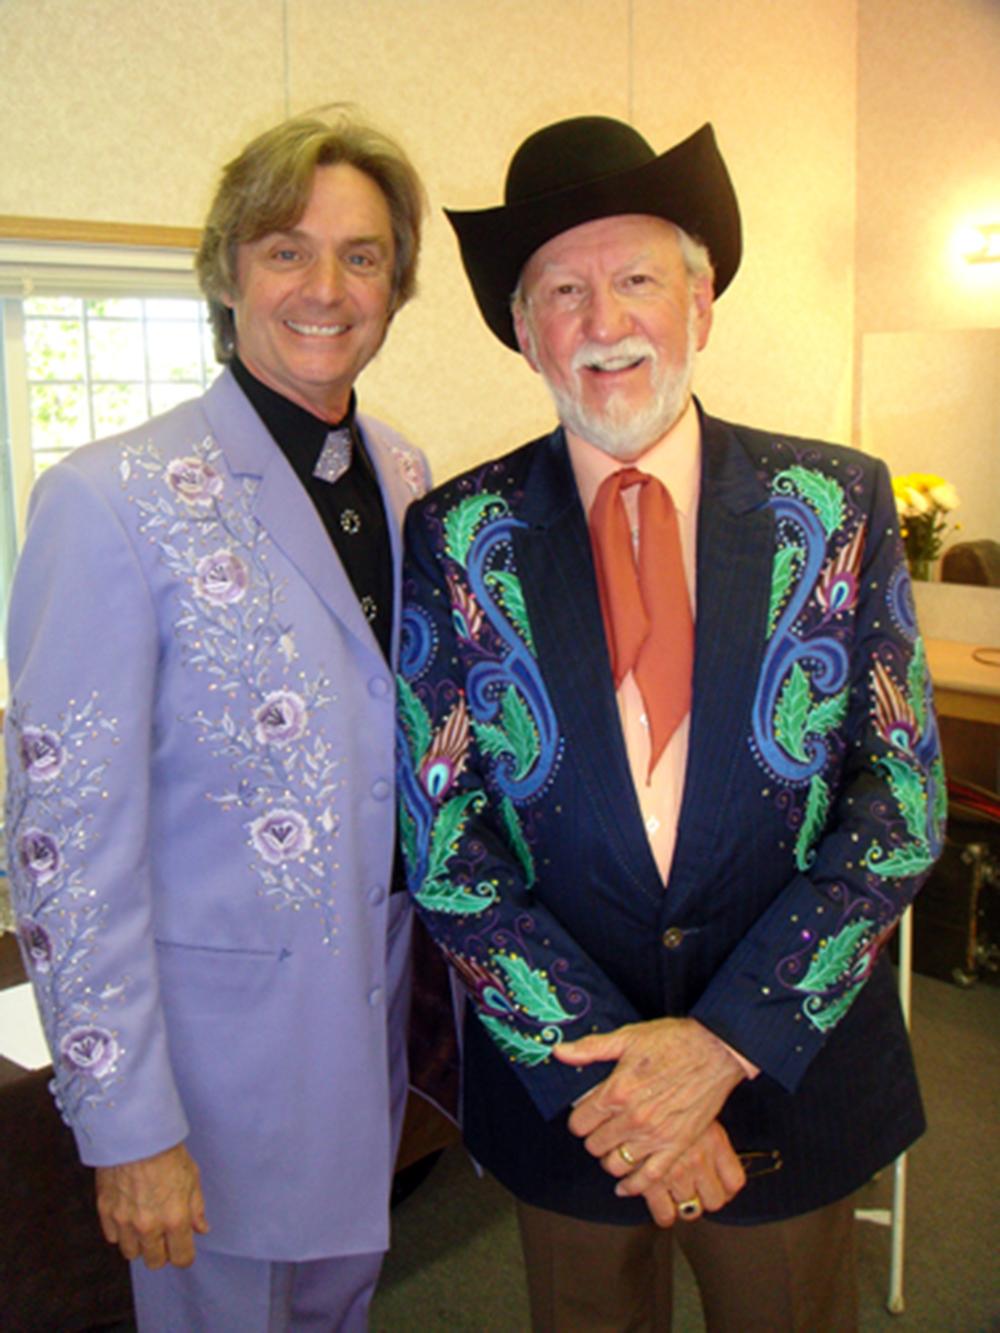 2011 - Harry Stinson & Doyle Lawson